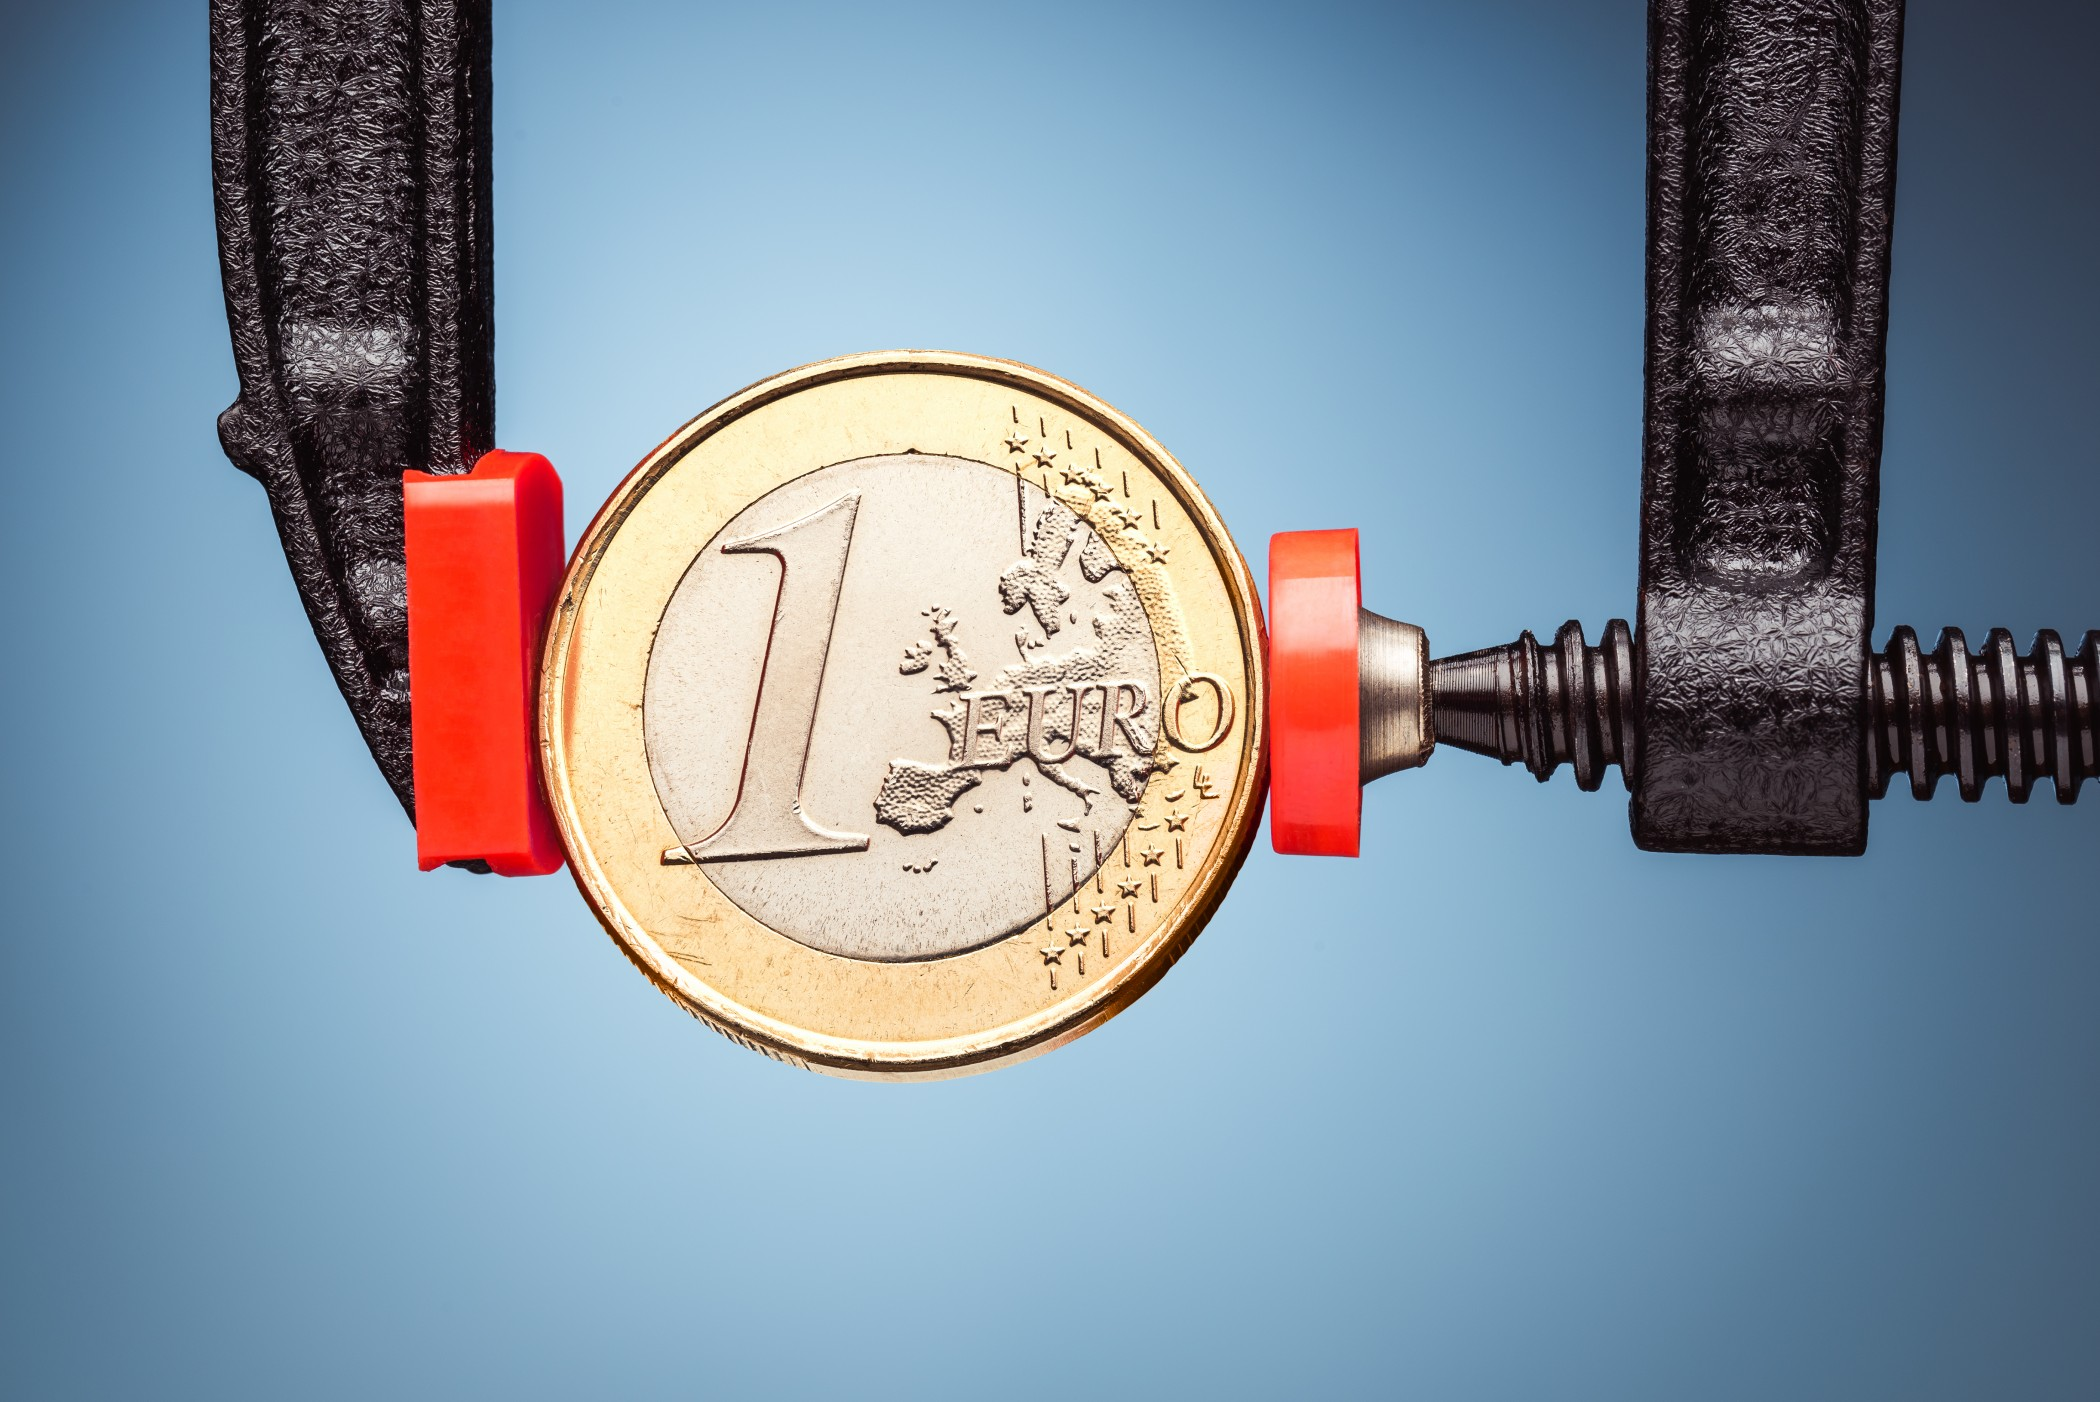 One Euro coin under pressure. Crisis concept.